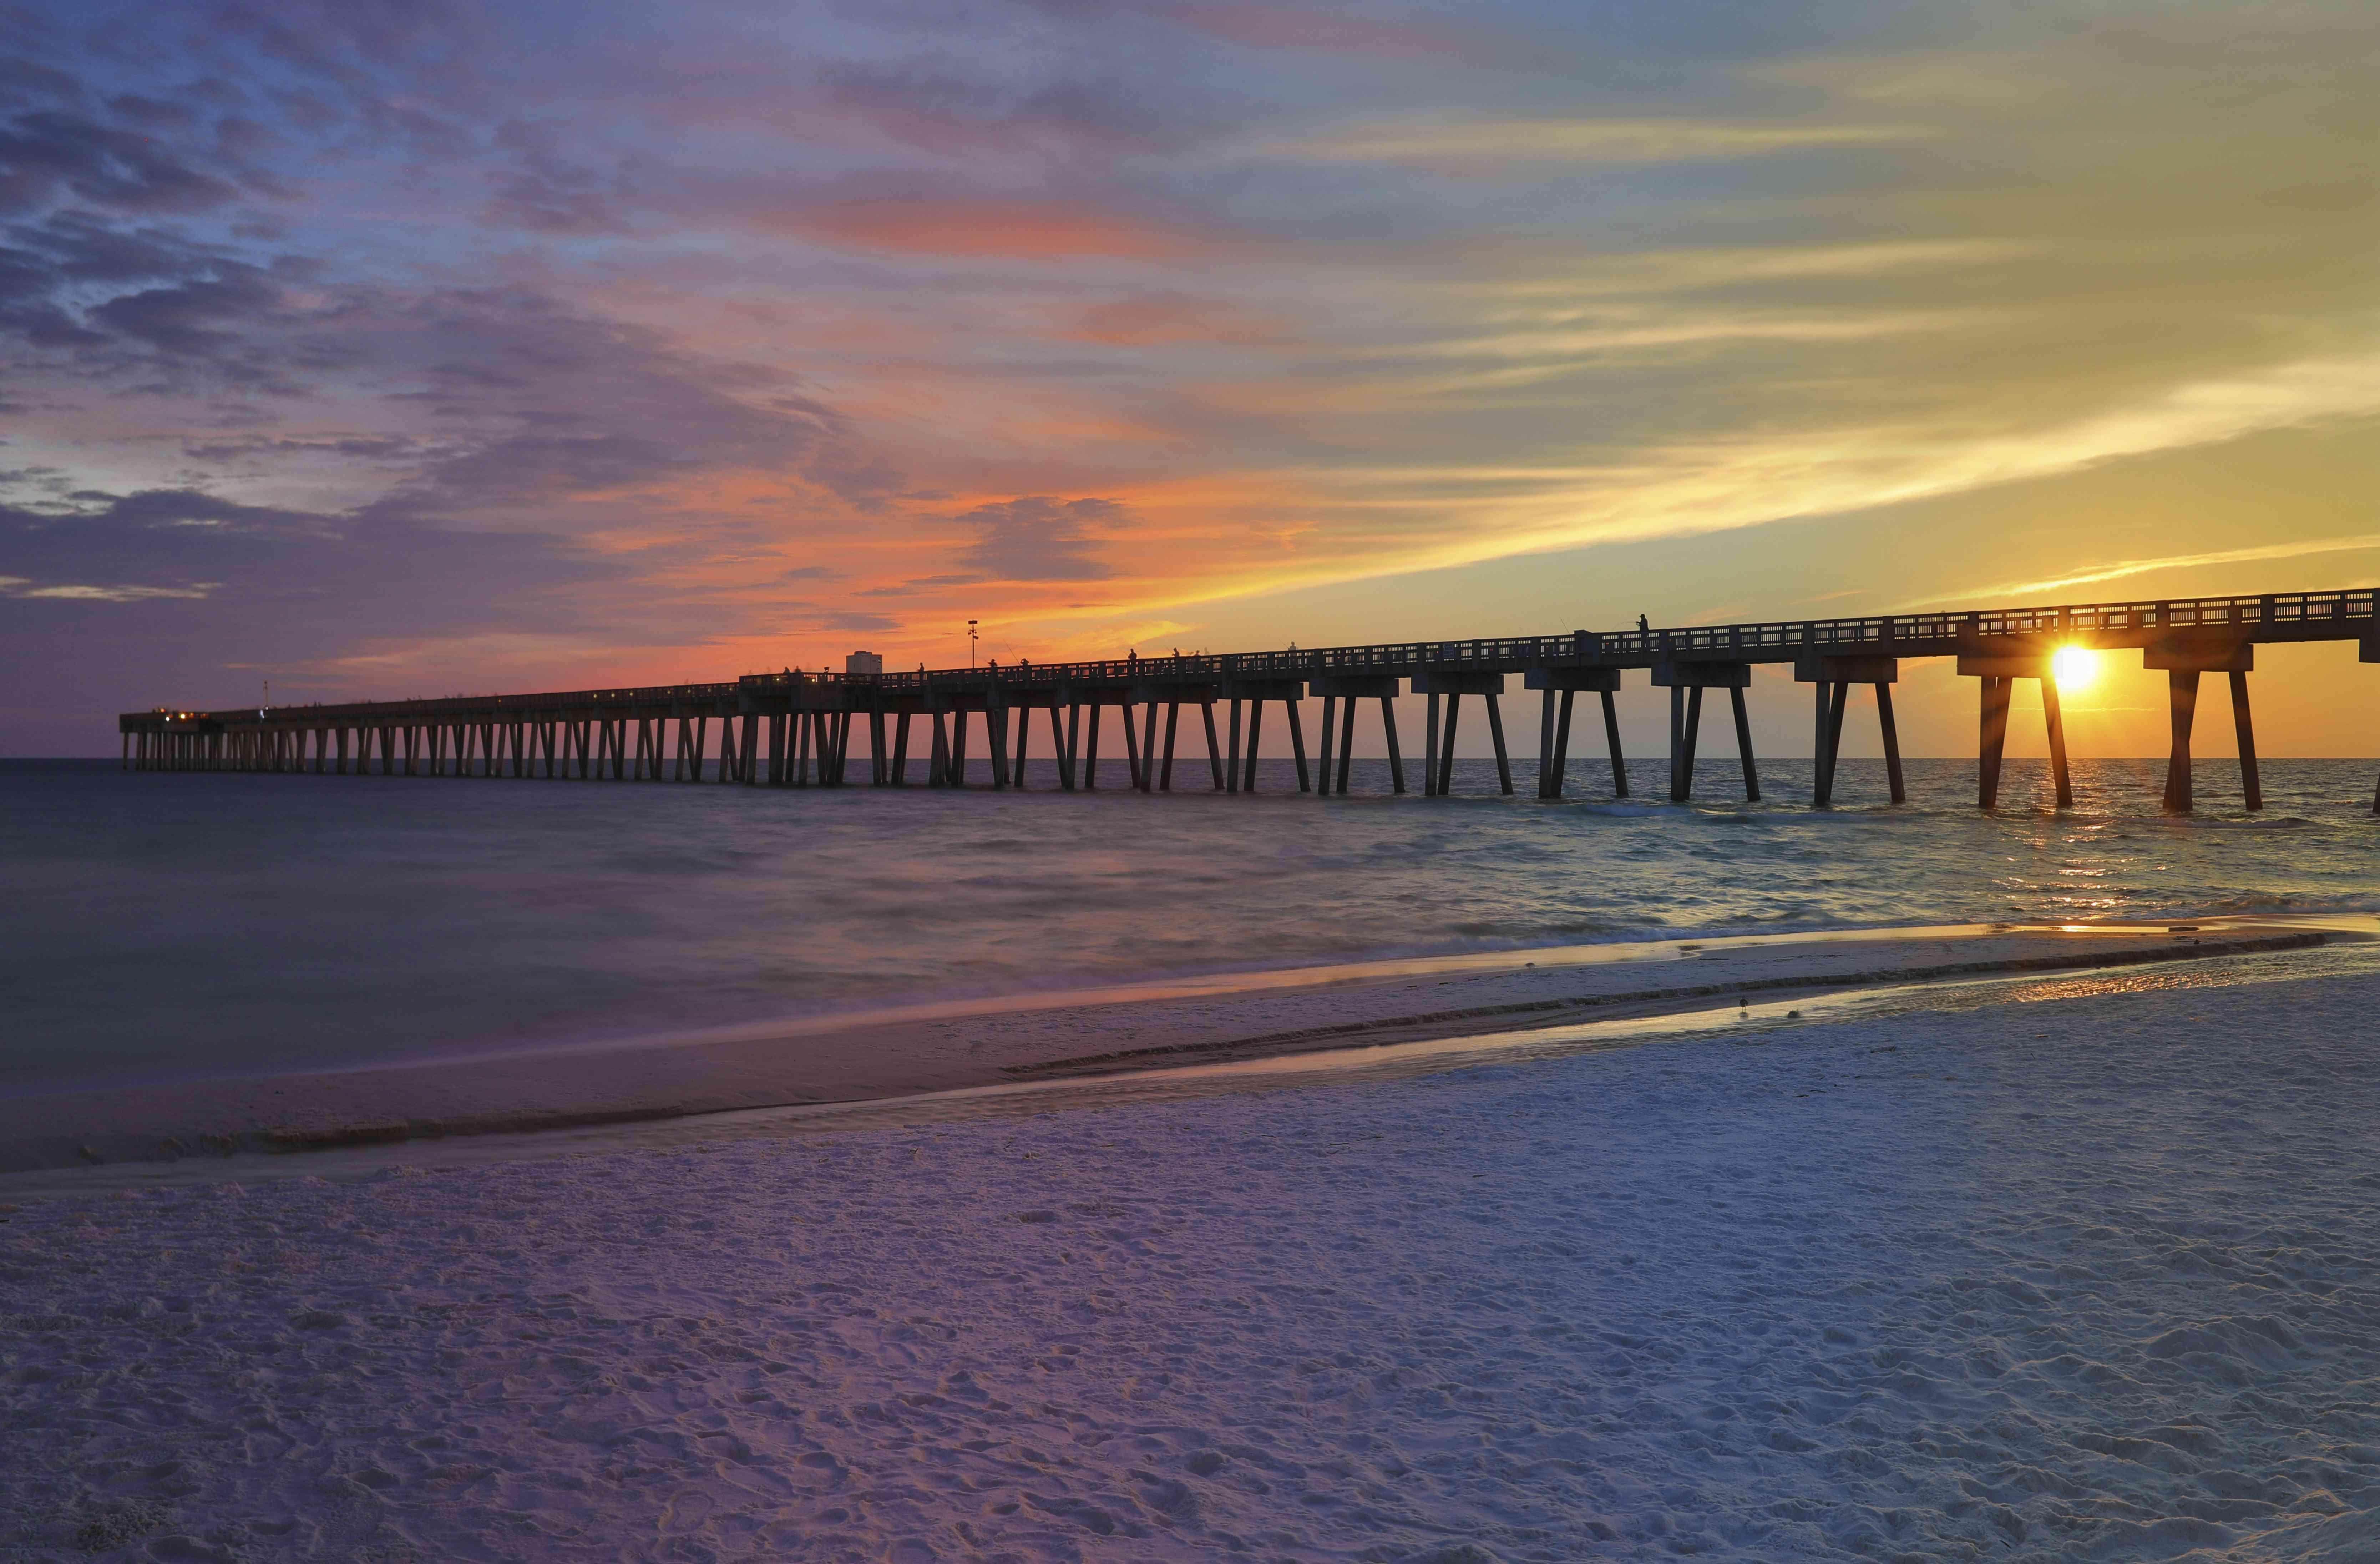 USA, Florida, M.B. Miller County Pier, Panama City Beach